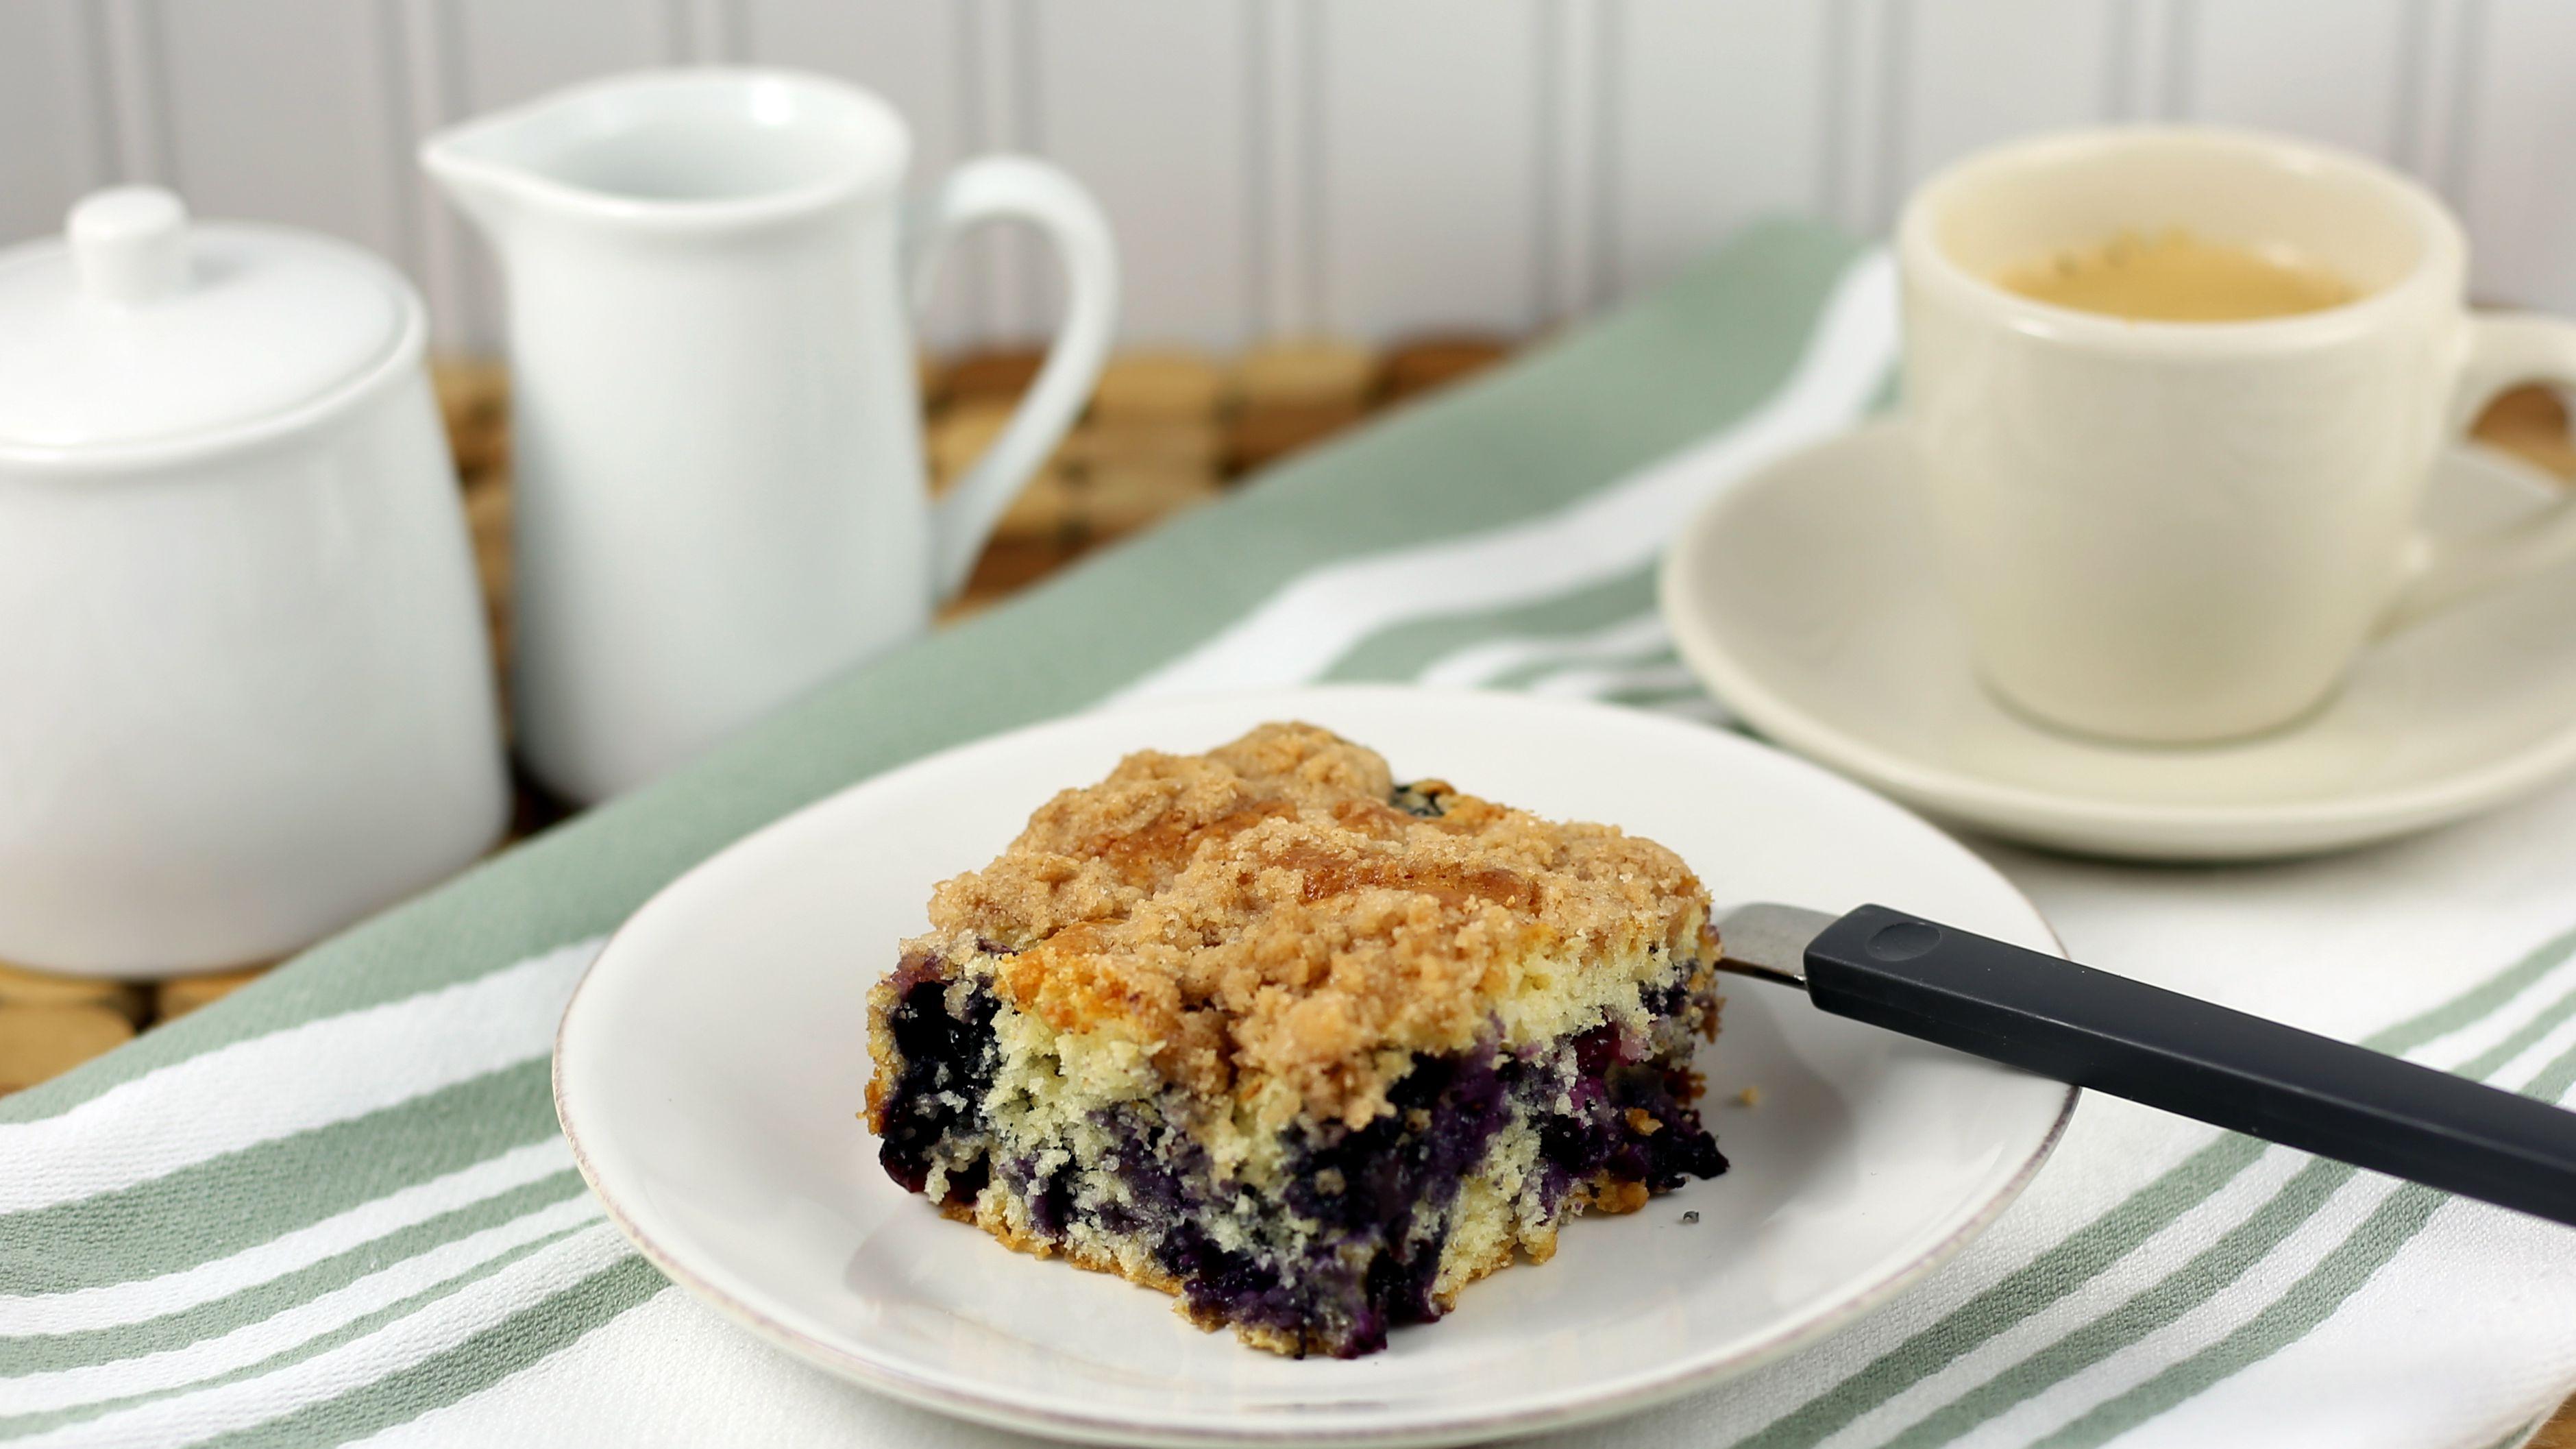 Best Recipes Using Fresh Or Frozen Blueberries